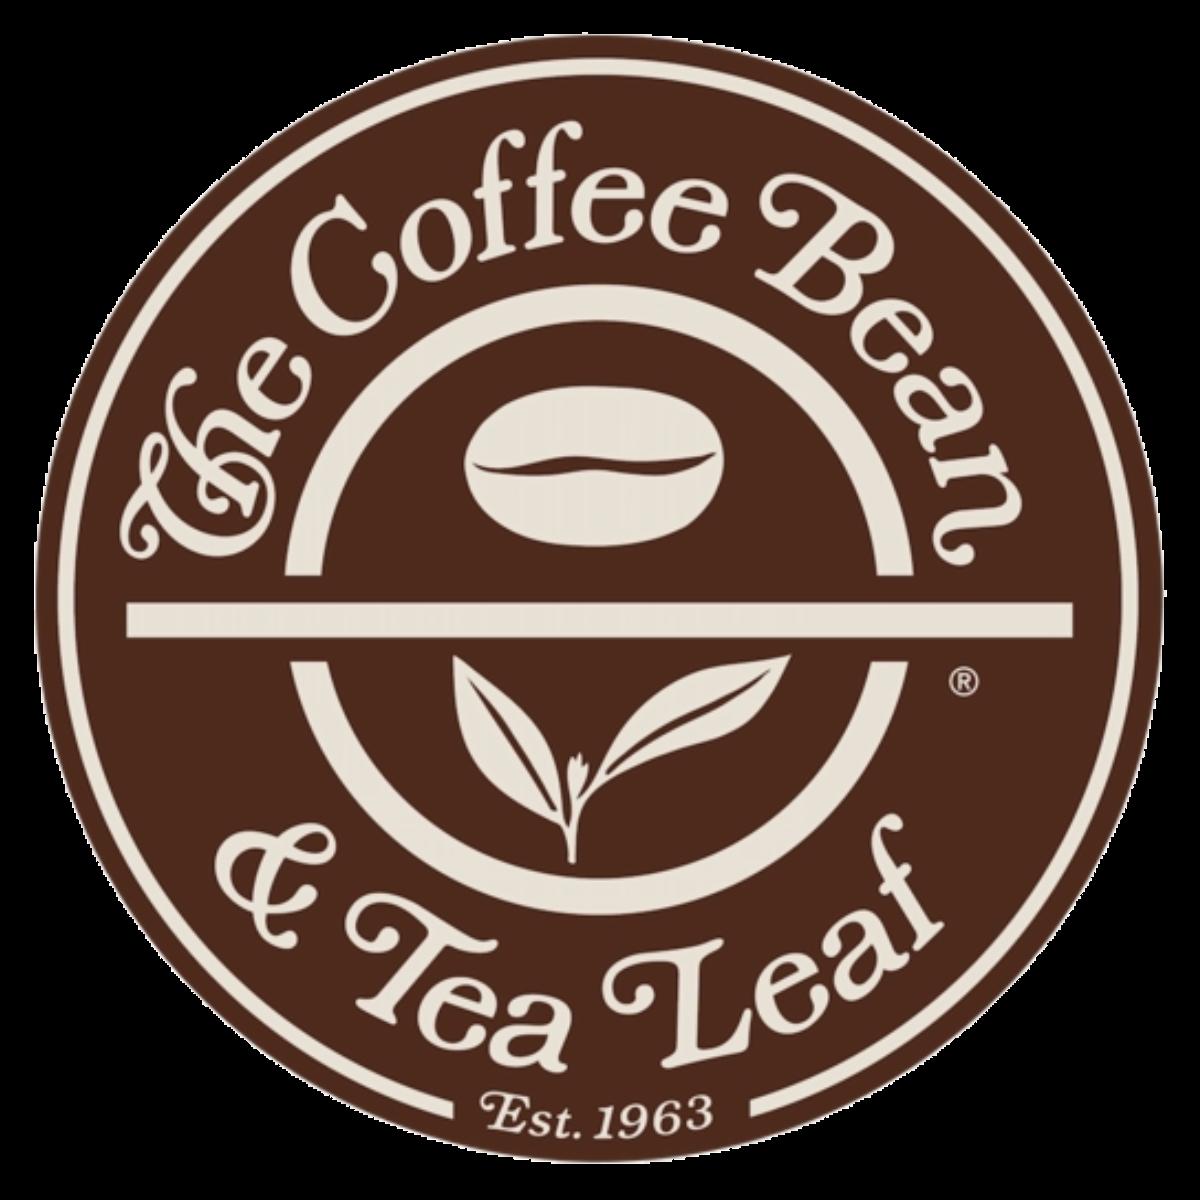 Coffee Beans & Tea Leaf